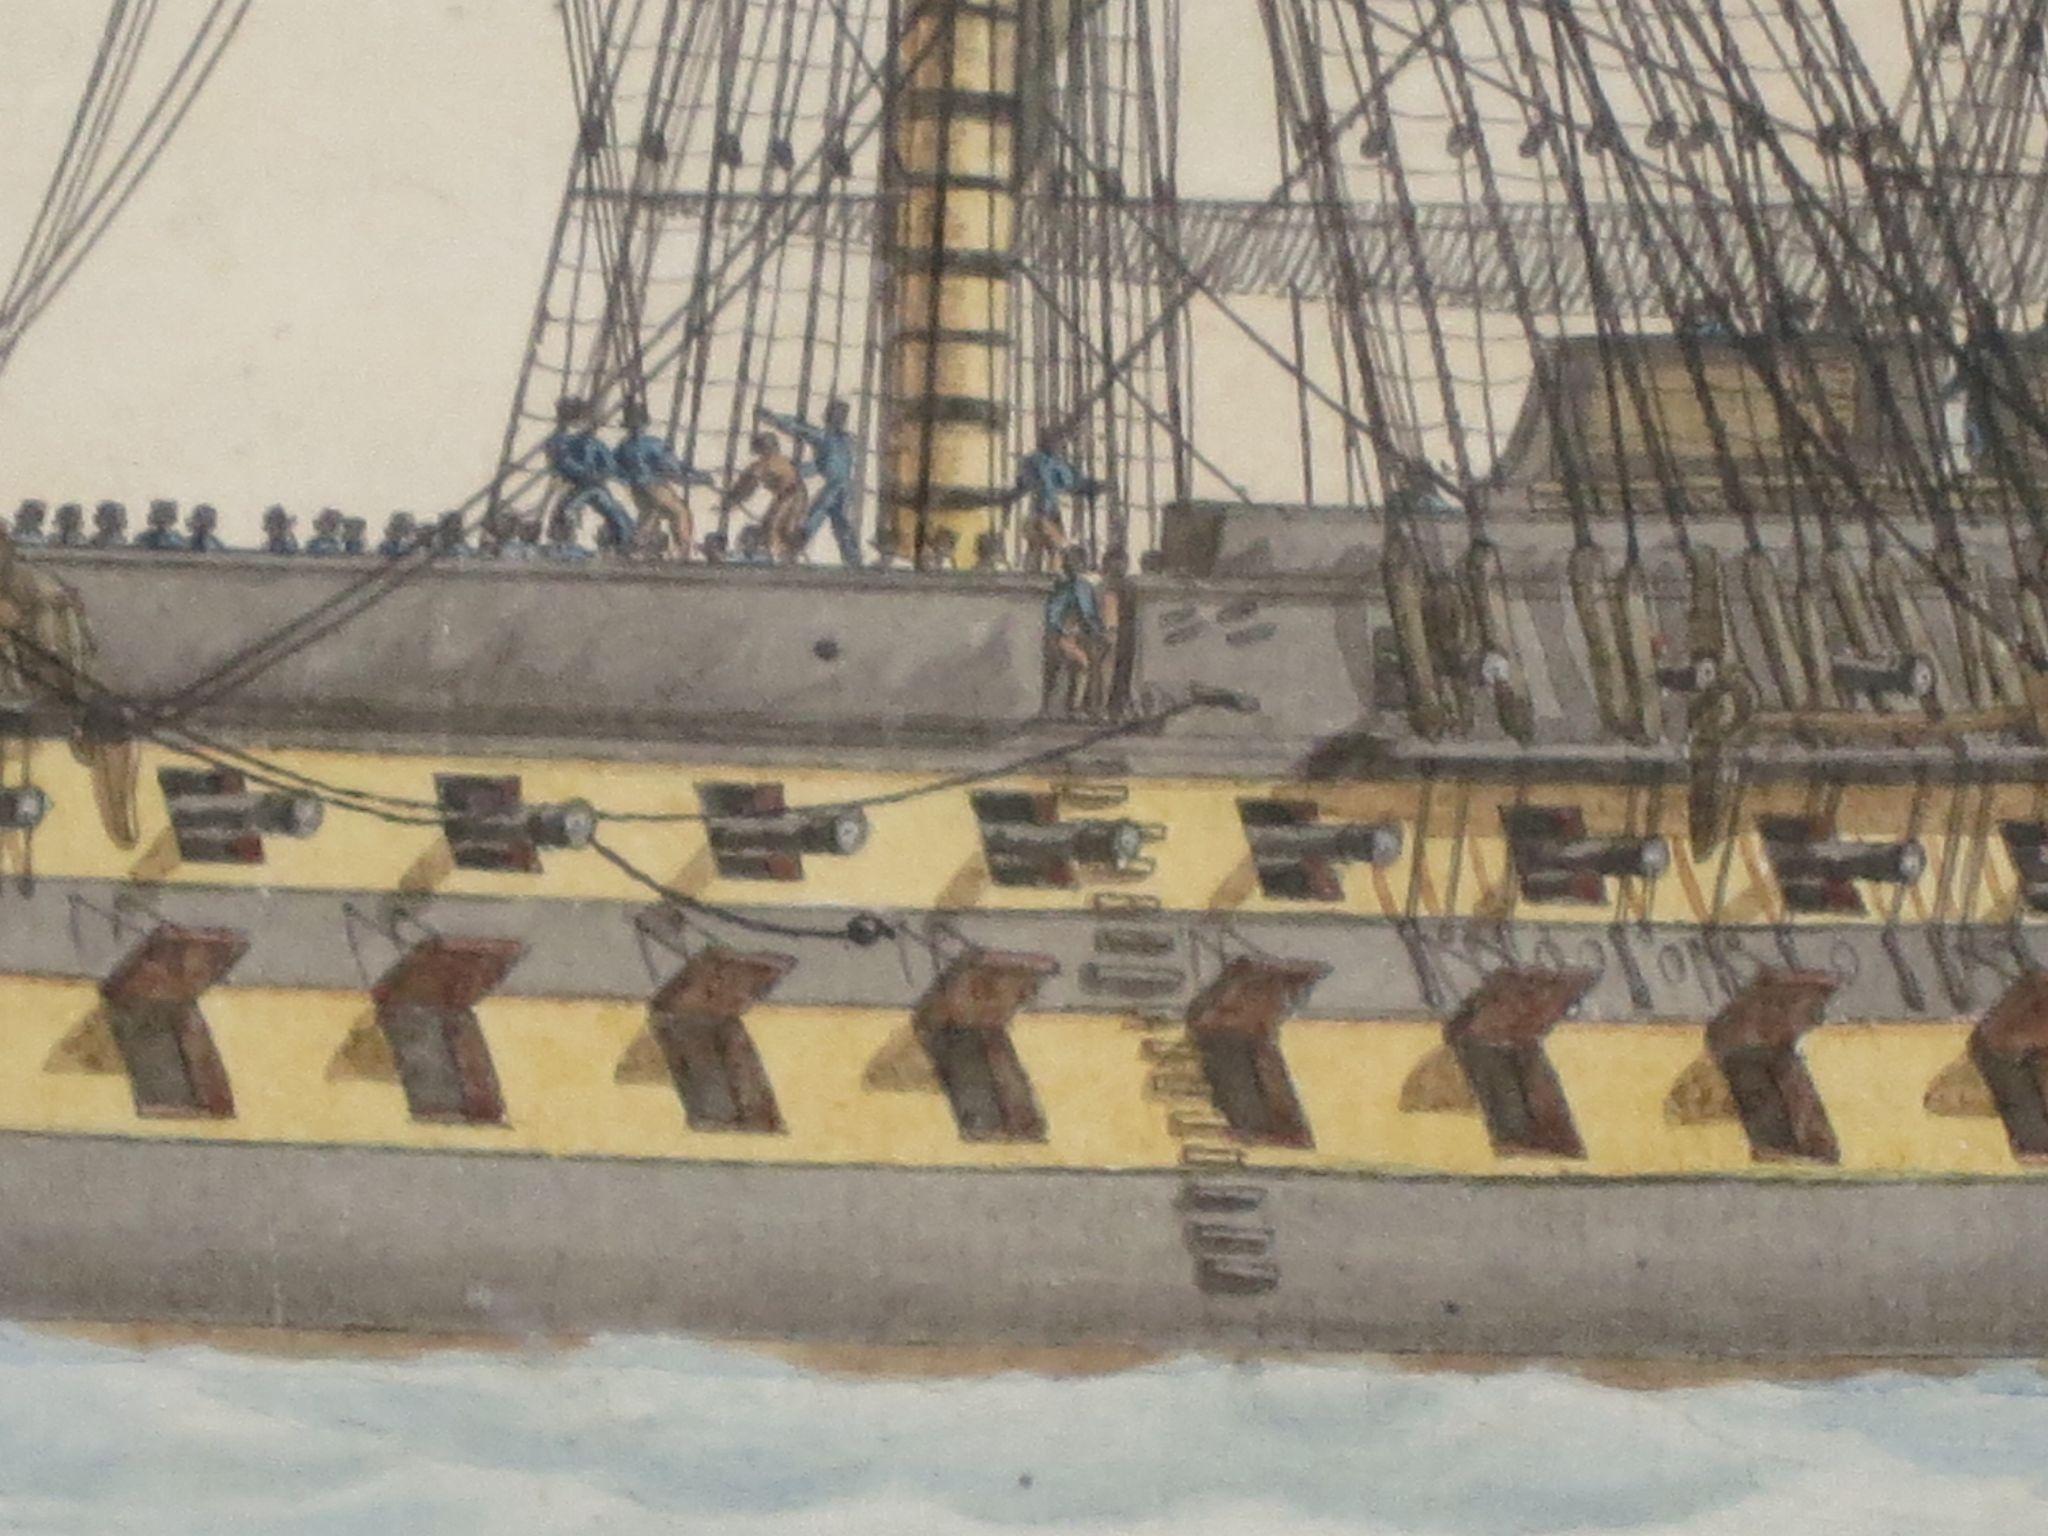 JOSEPH-ANGE ANTOINE ROUX (FRENCH, 1765-1835) - Image 11 of 15